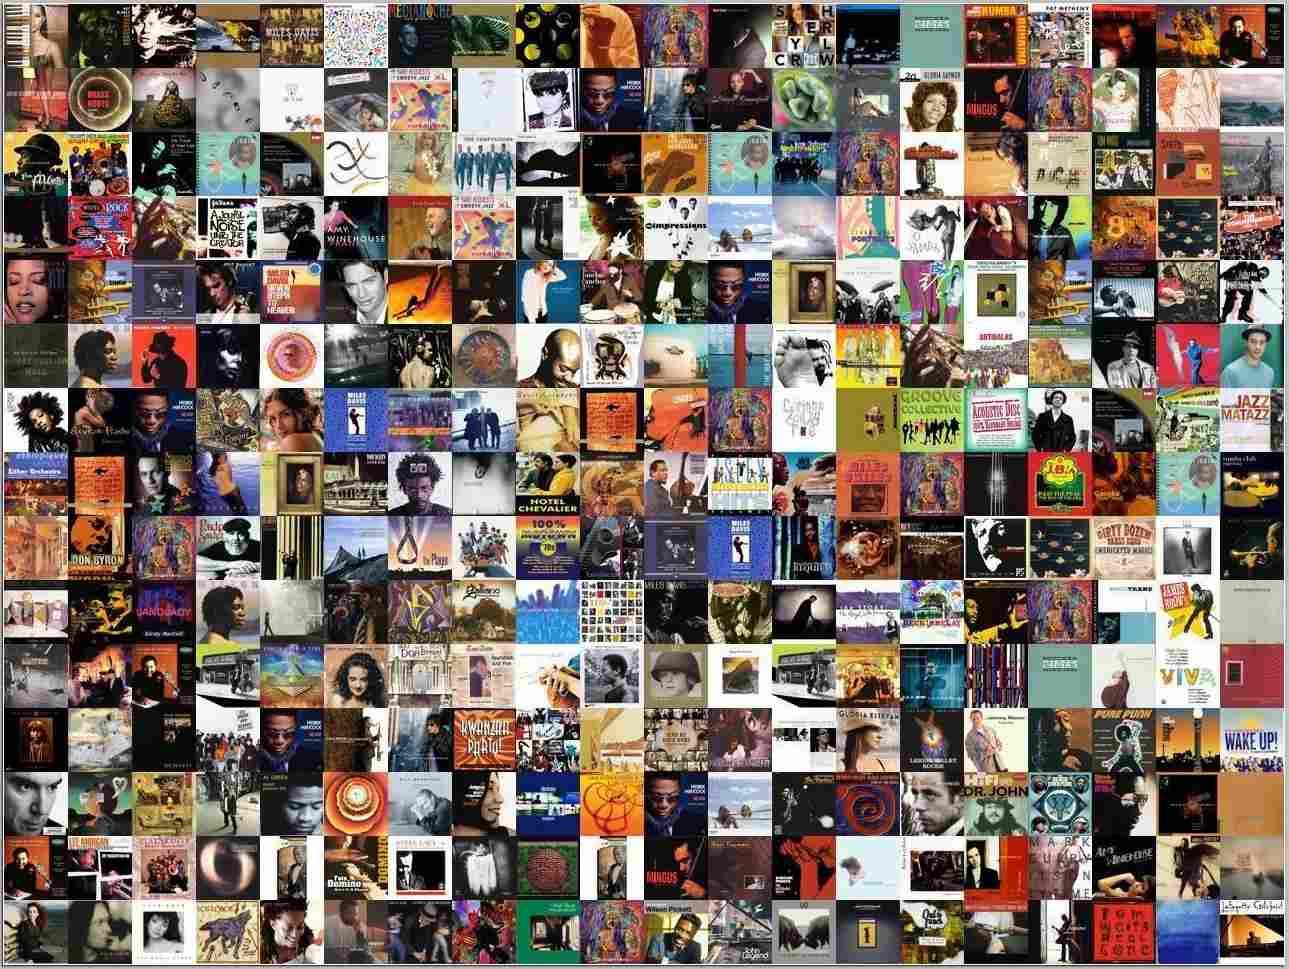 Album Cover Wallpaper Generator - Collage Of Album Covers 2017 - HD Wallpaper